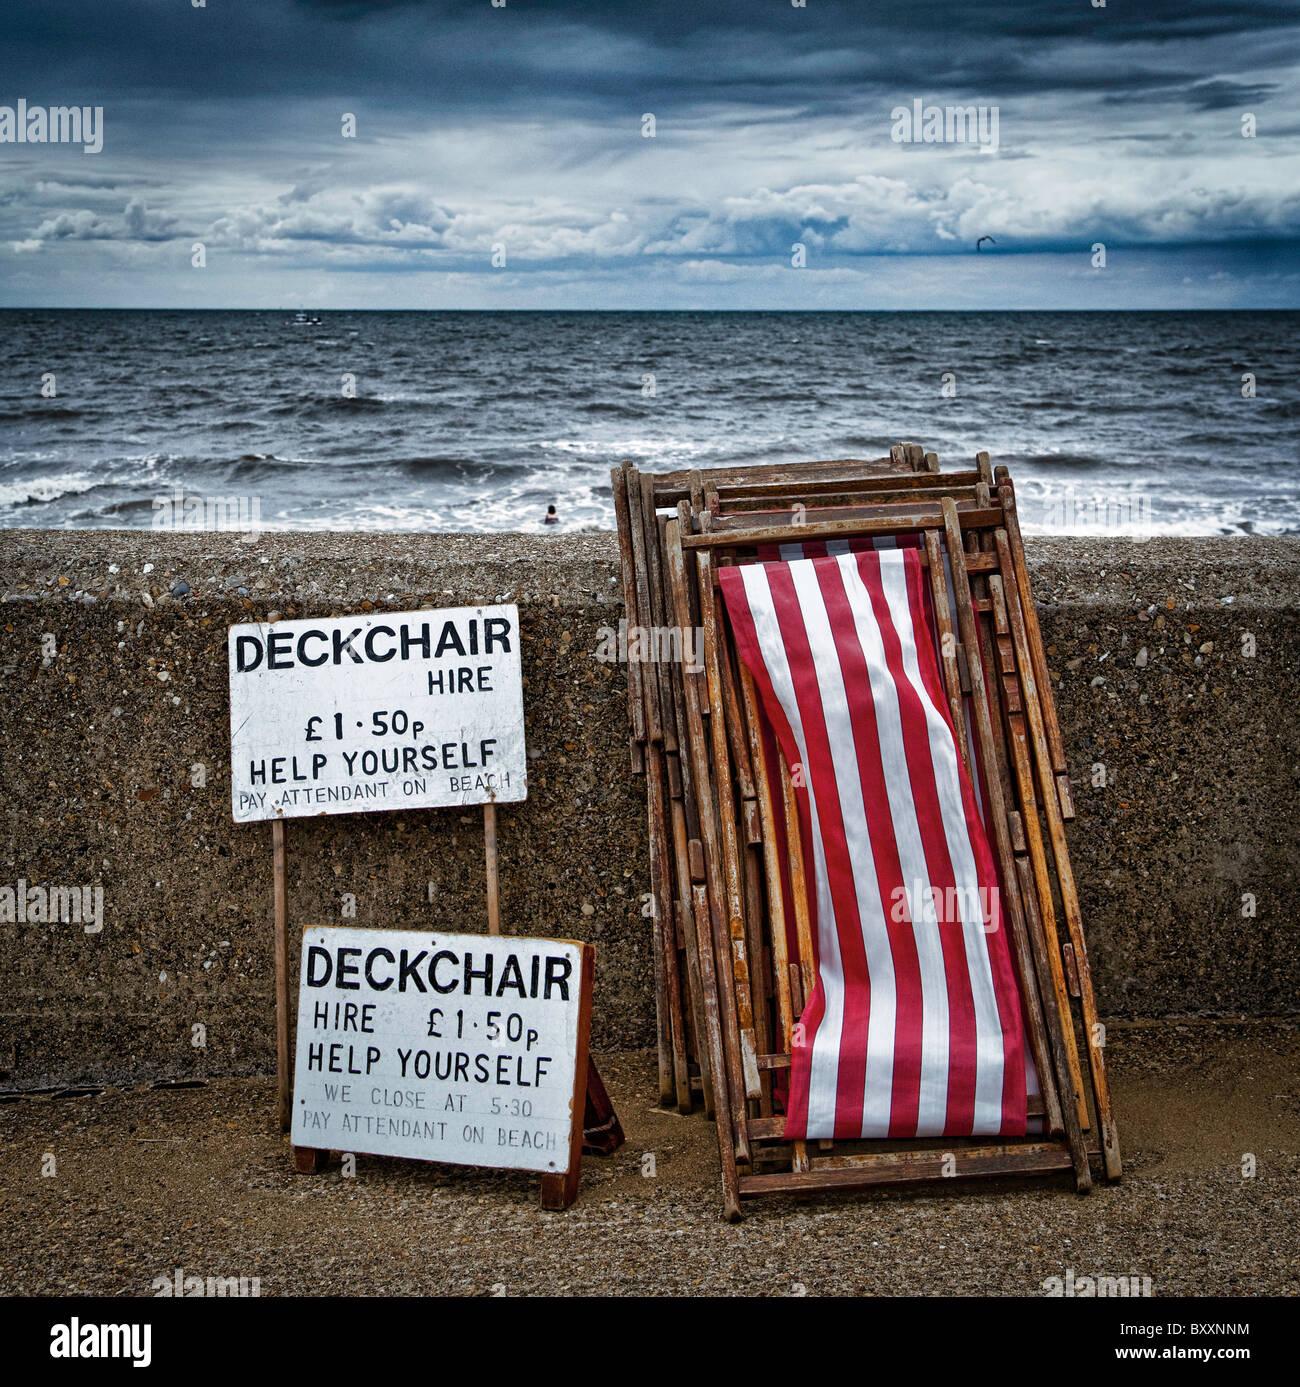 Deckchair' s for Hire, Hunstanton, Norfolk, Britain - Aug 2010 - Stock Image